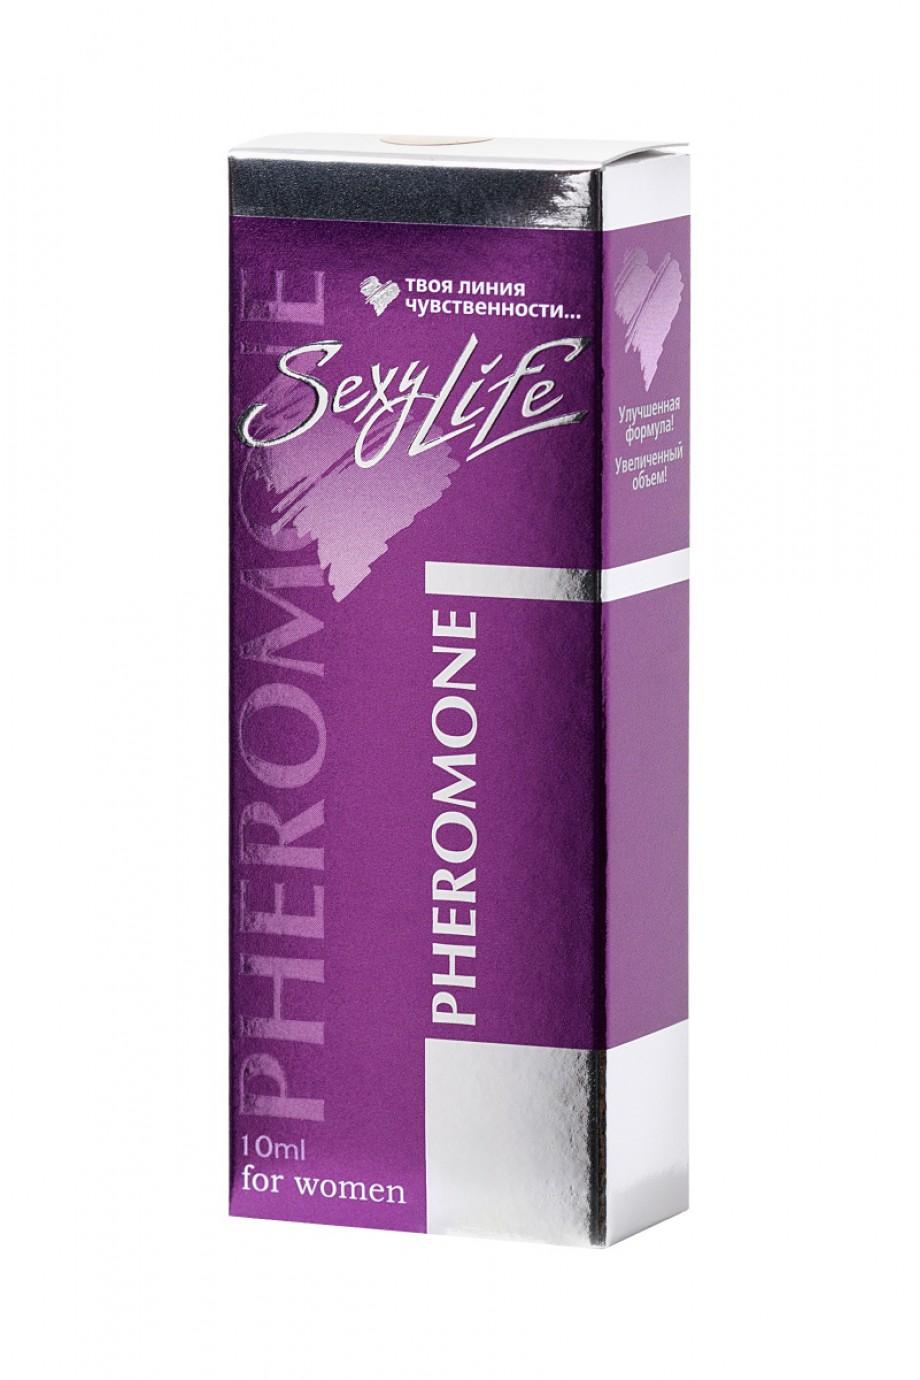 Духи с феромонами Sexy Life №4 философия аромата L'Imperatric, женские, 10 мл